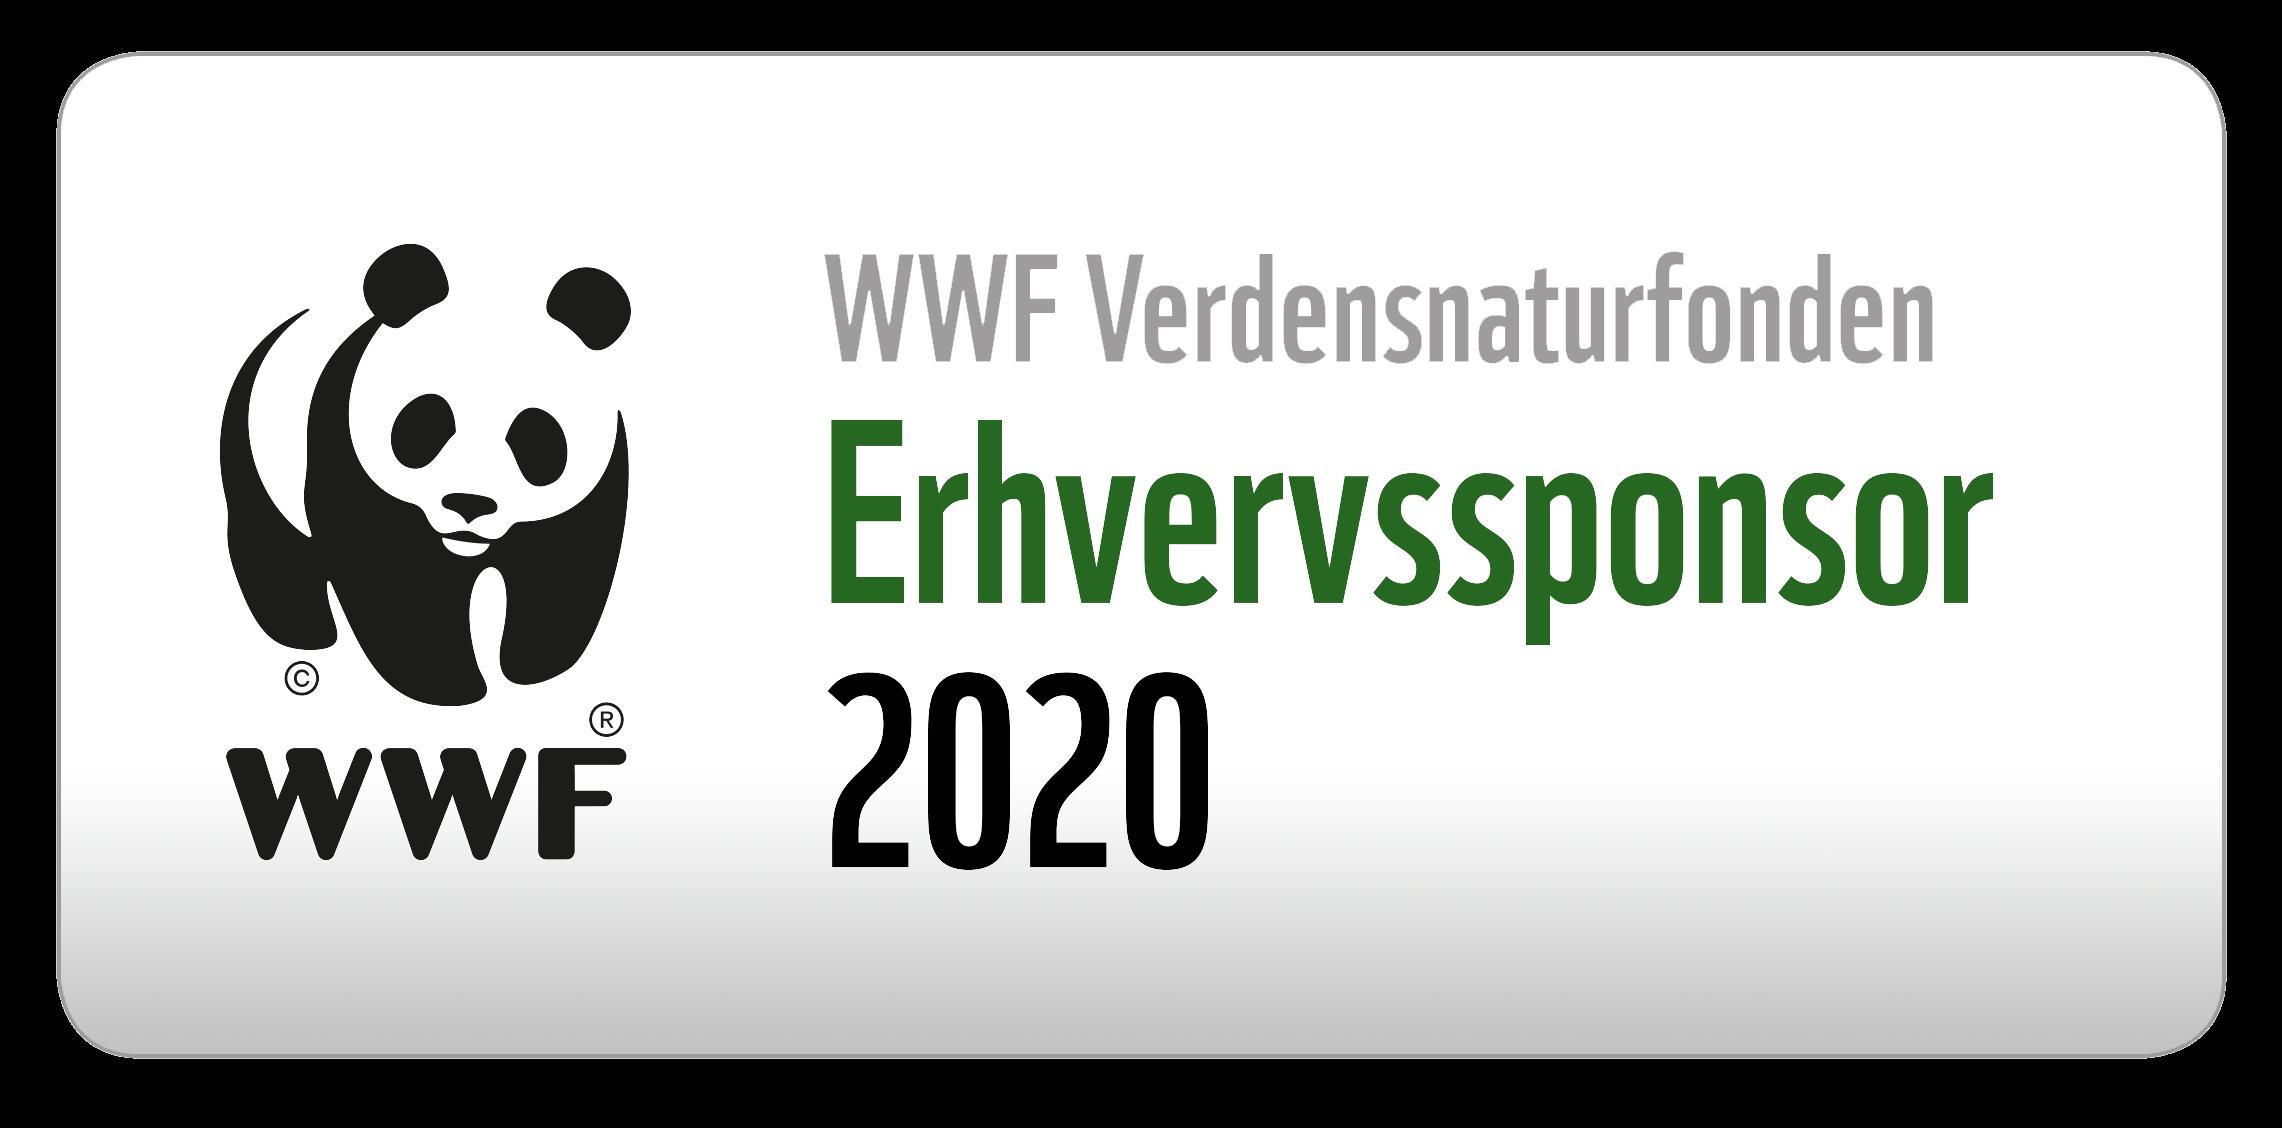 WWF Verdensnaturfonden Erhvervssponsor 2020